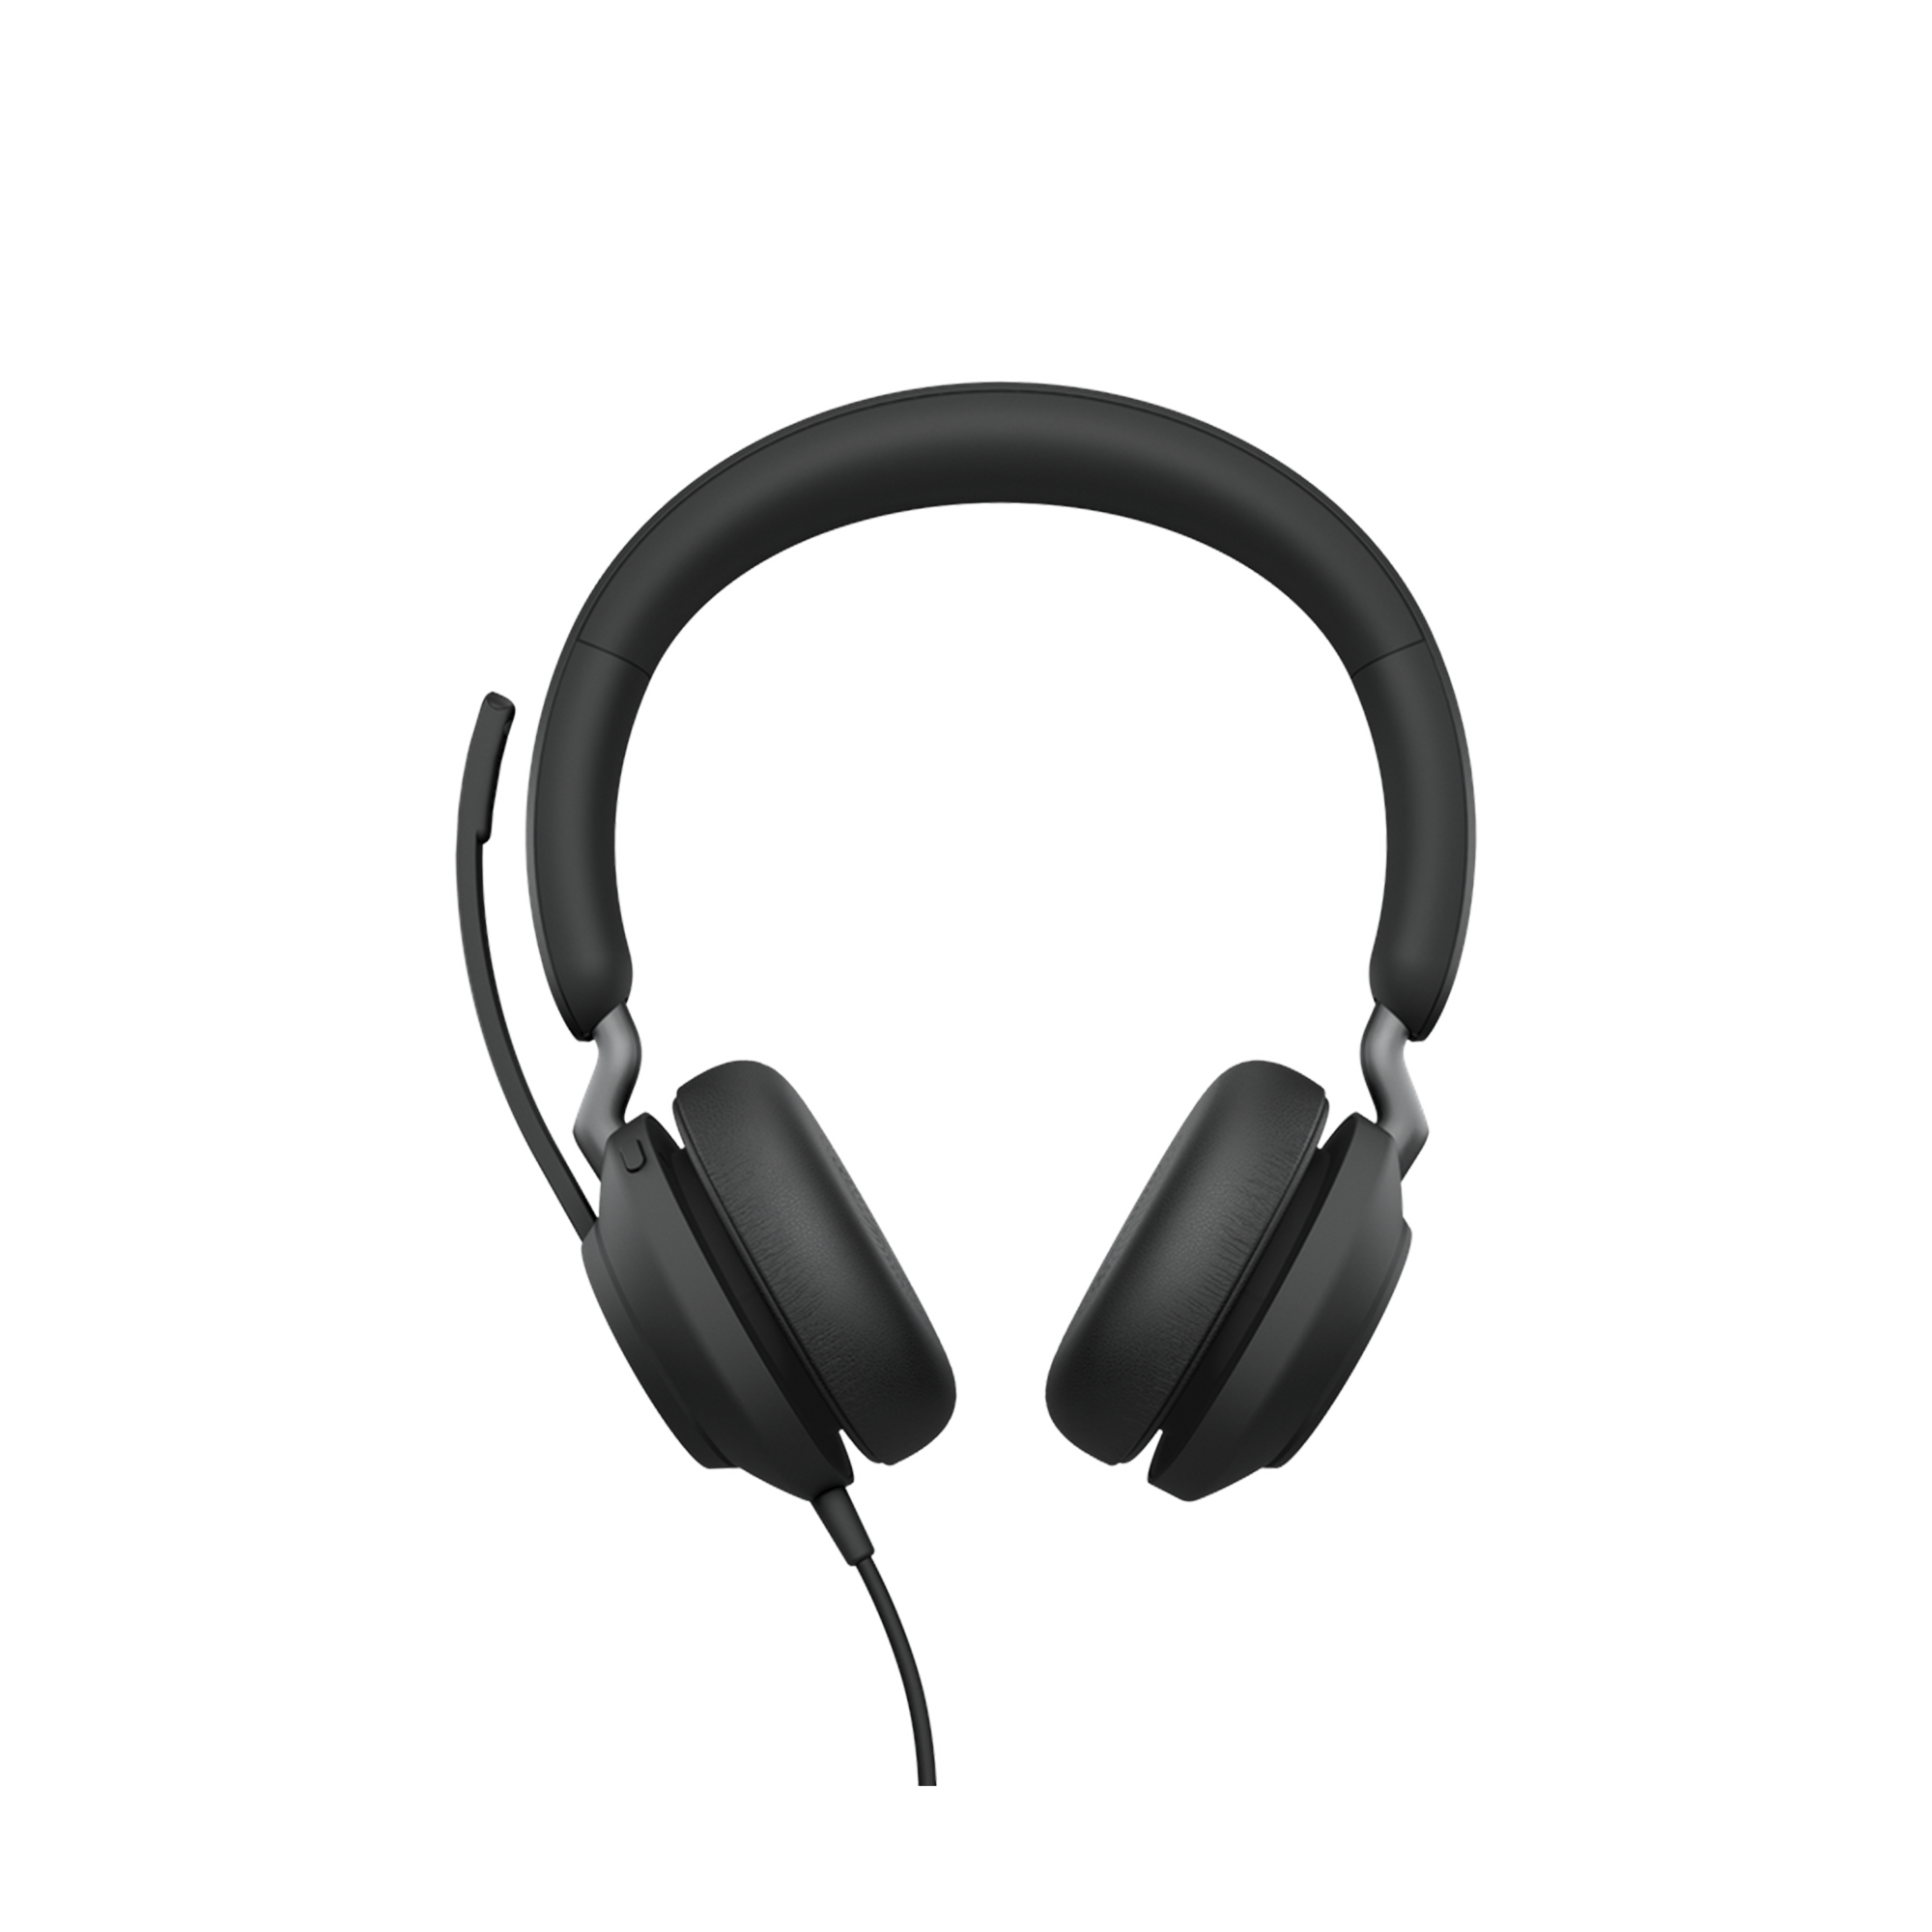 Jabra Jabra Evolve 2 40, Auricular stereo version UC con aislamiento de ruido, conexion USB-A y indicador de ocupado (Busylight) (24089-989-999)